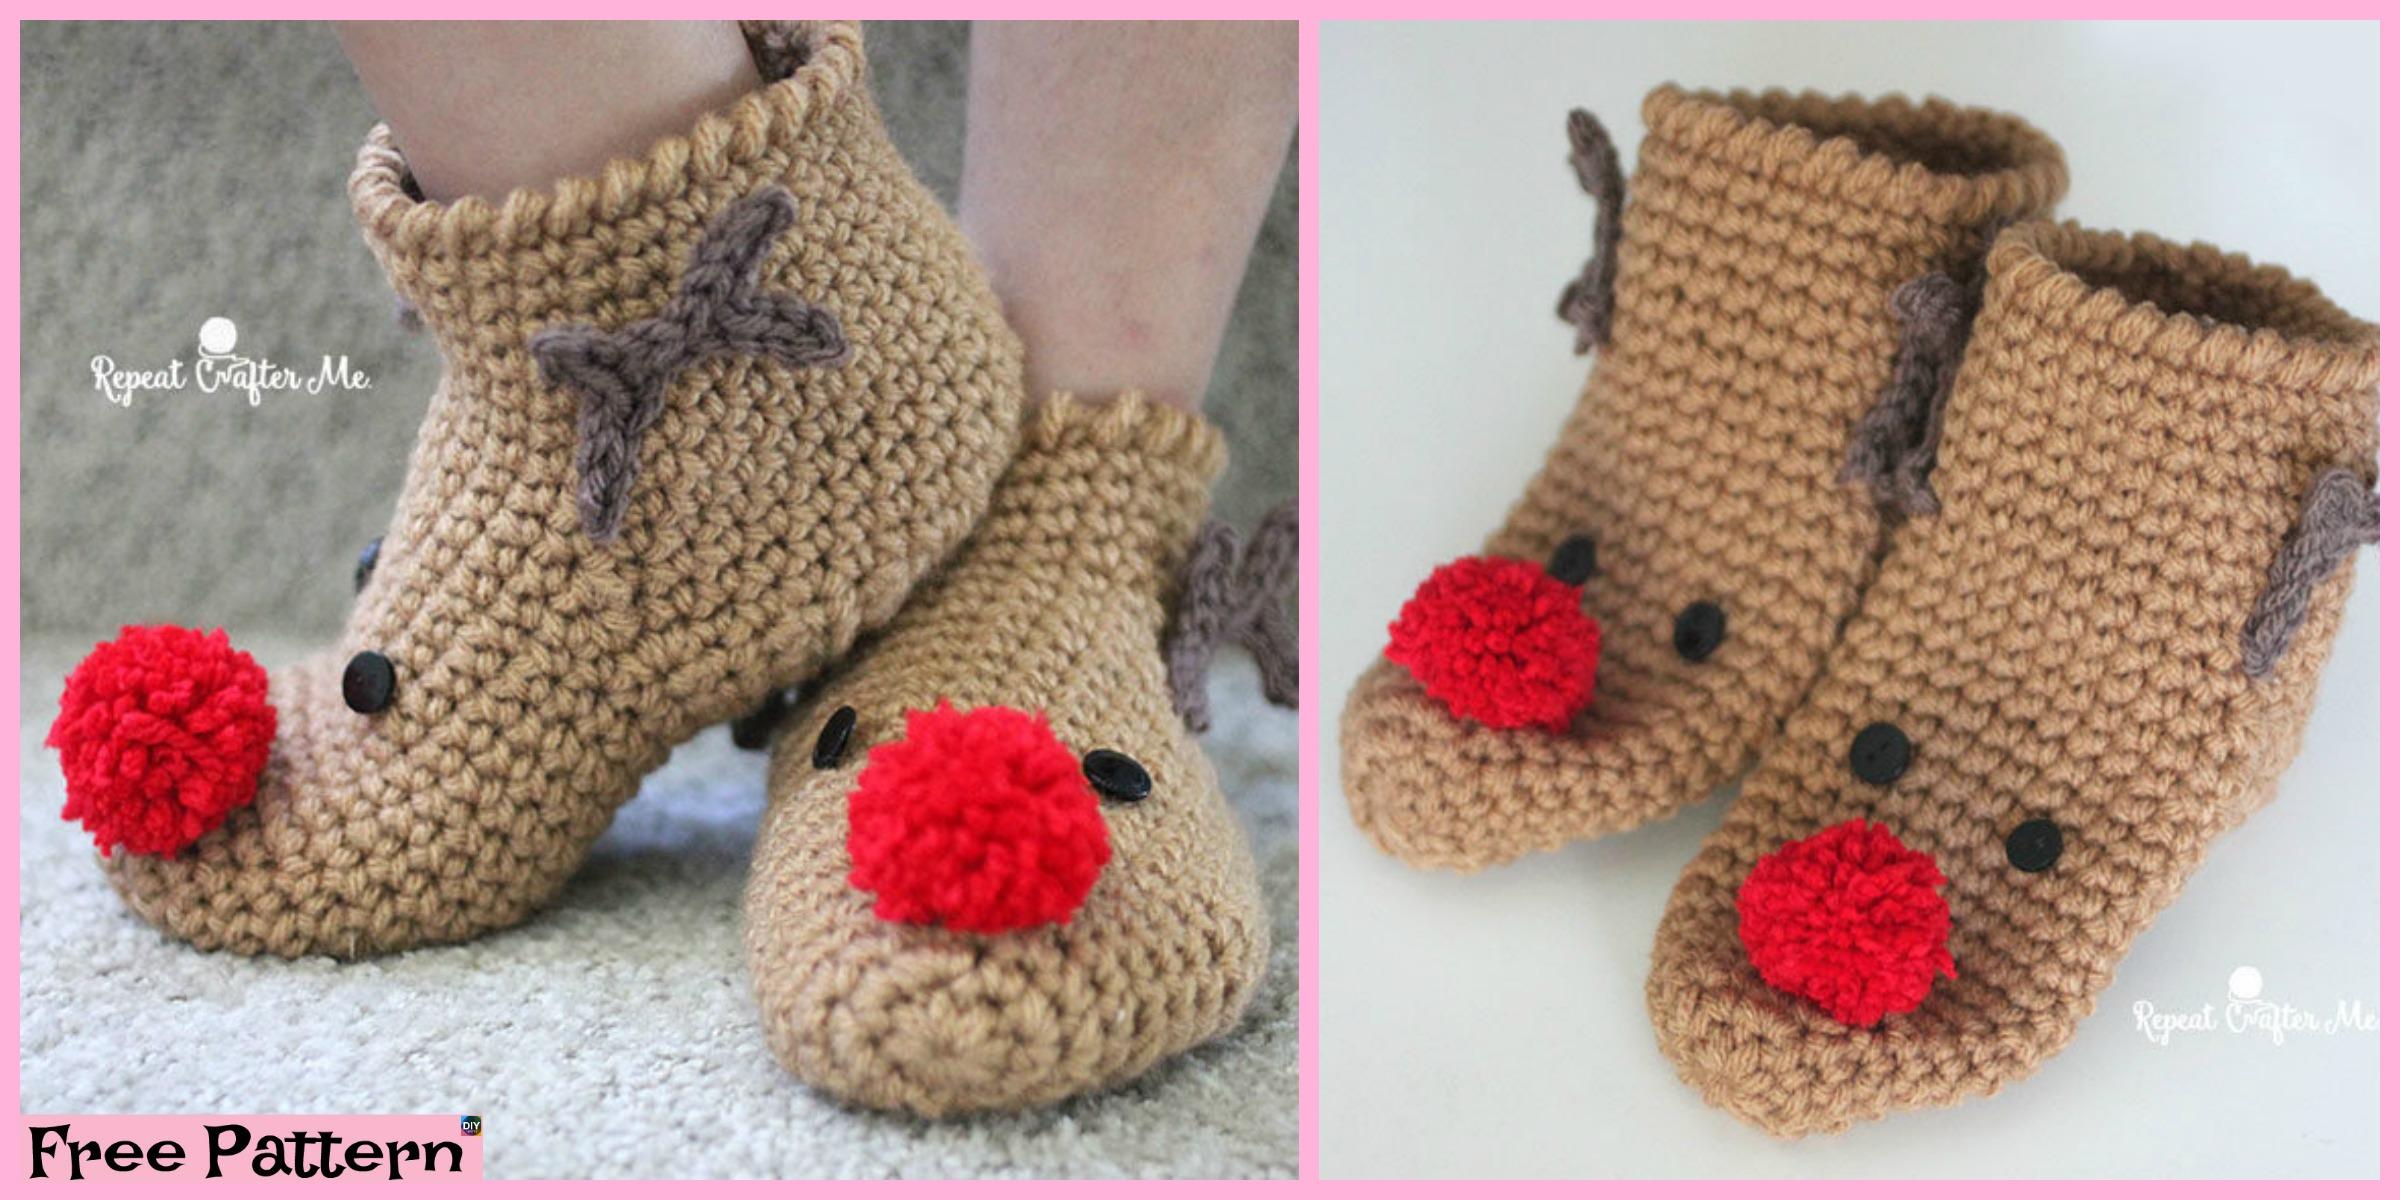 Amigurumi Christmas Reindeer Free Crochet Pattern | 1200x2400